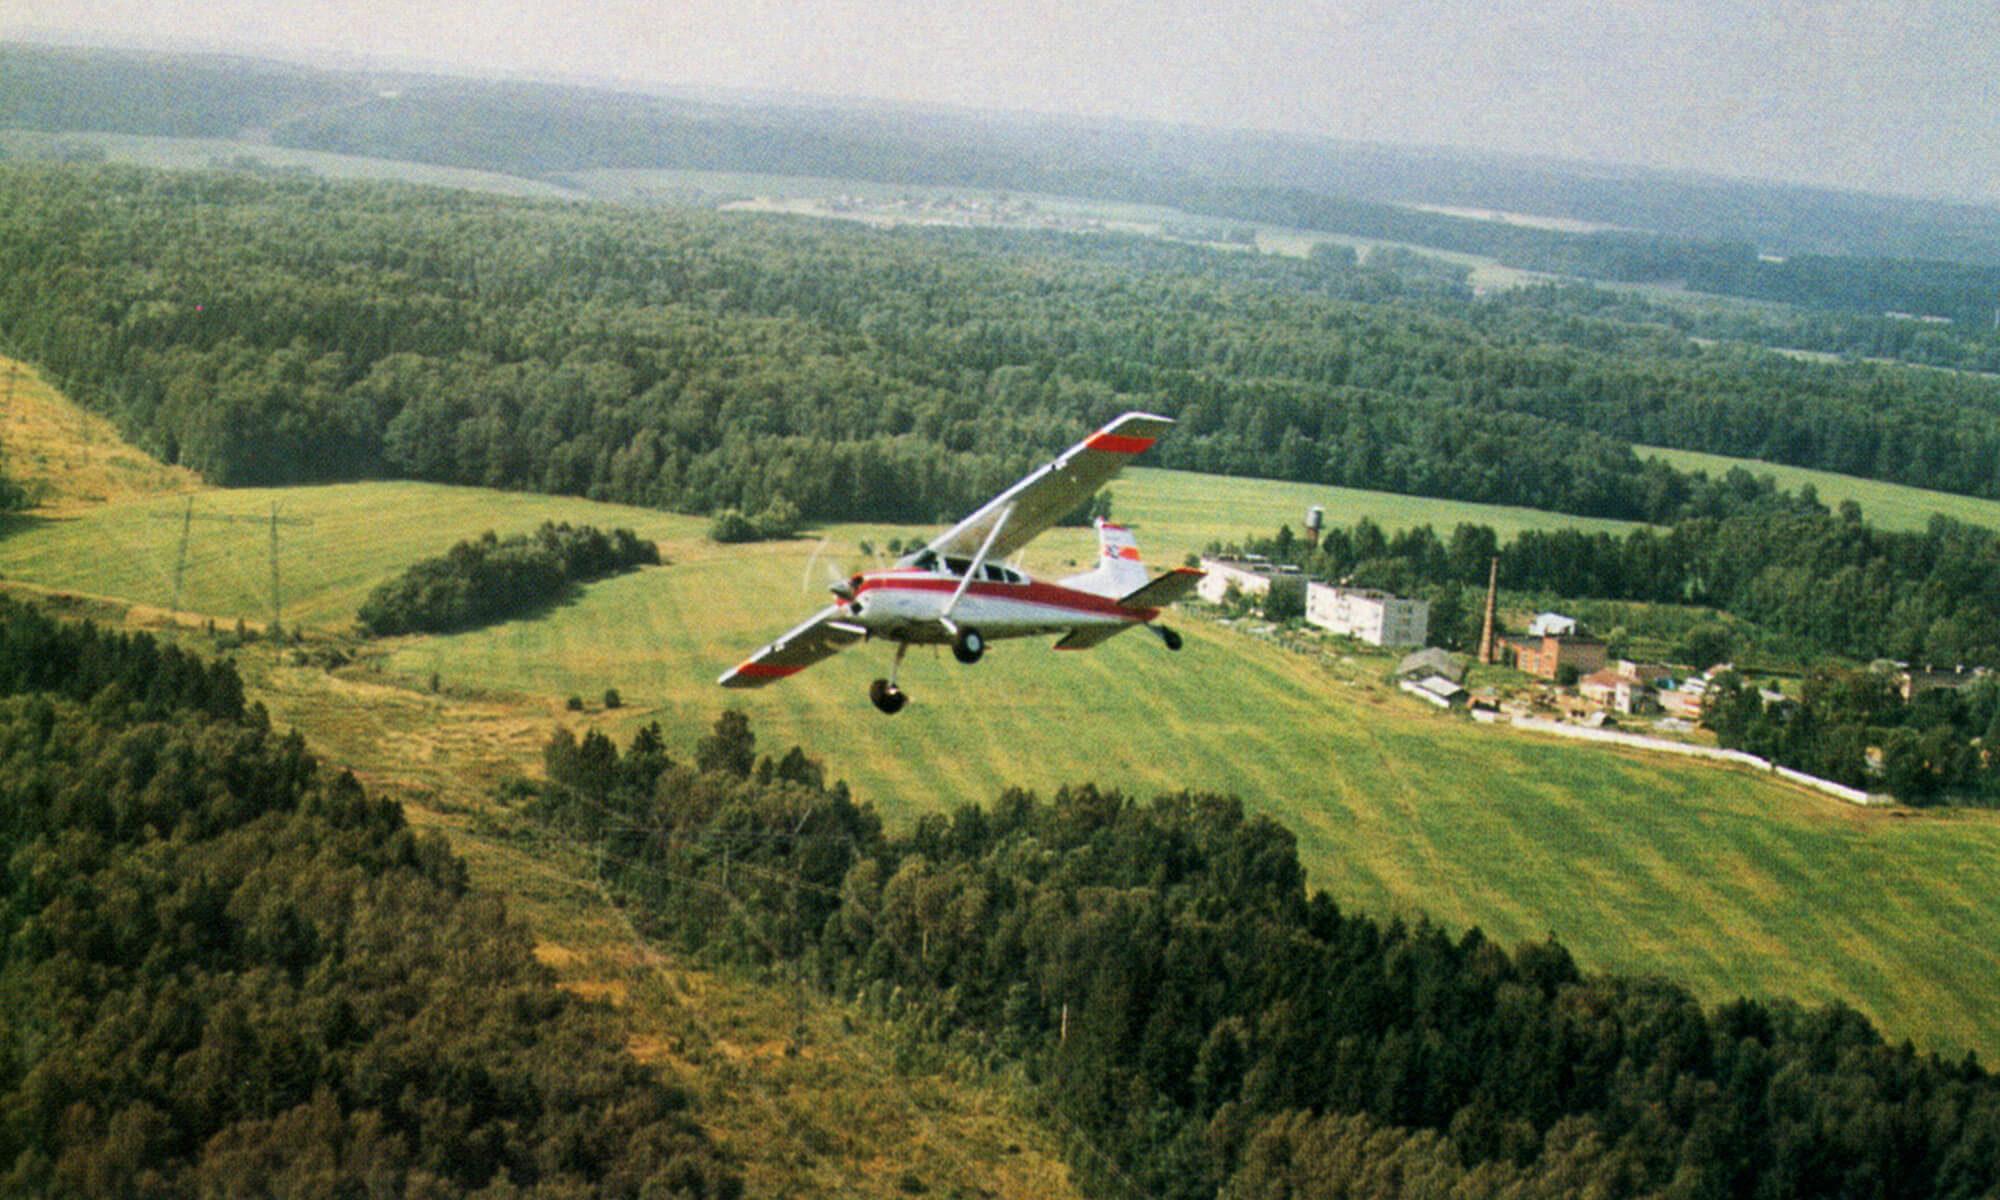 John Proctor Flying Service